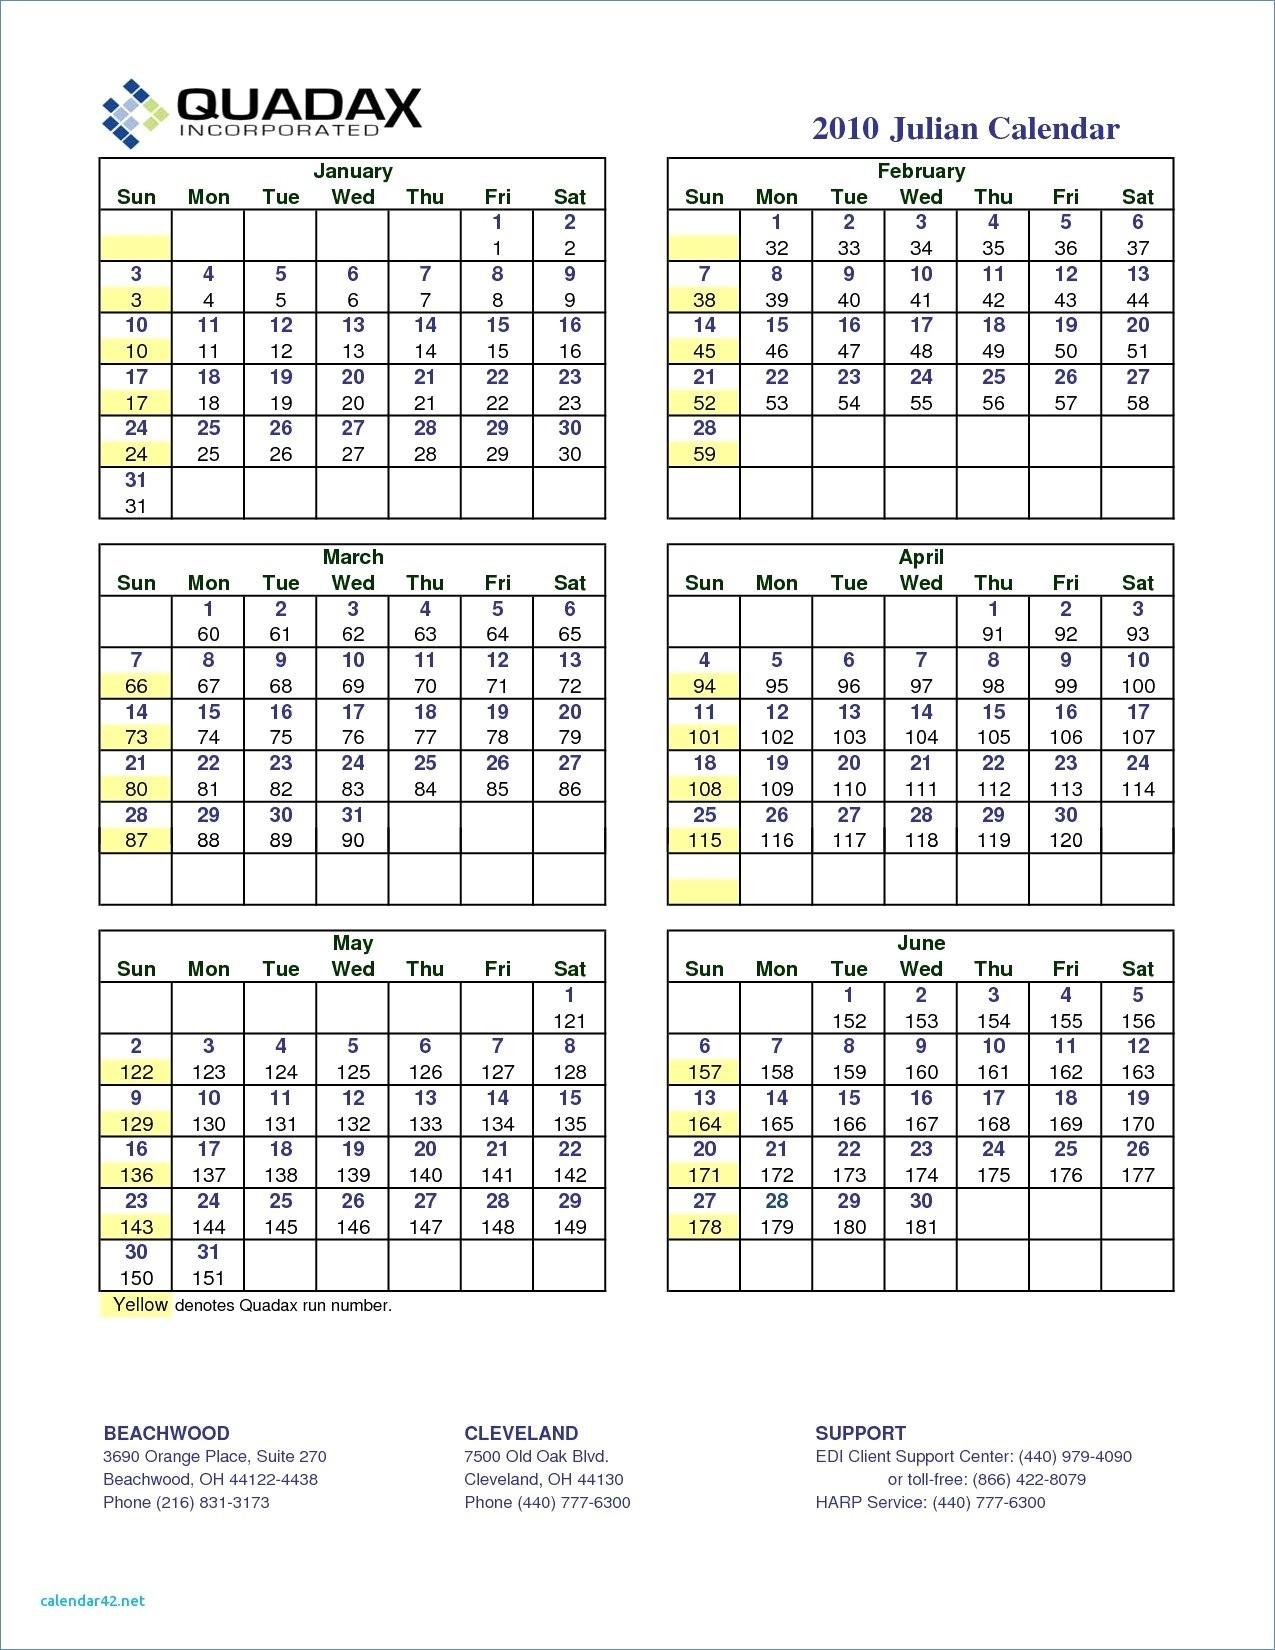 Quadax Julian Calendar 2020 Pdf | Example Calendar Printable inside Julian Calendar 2018